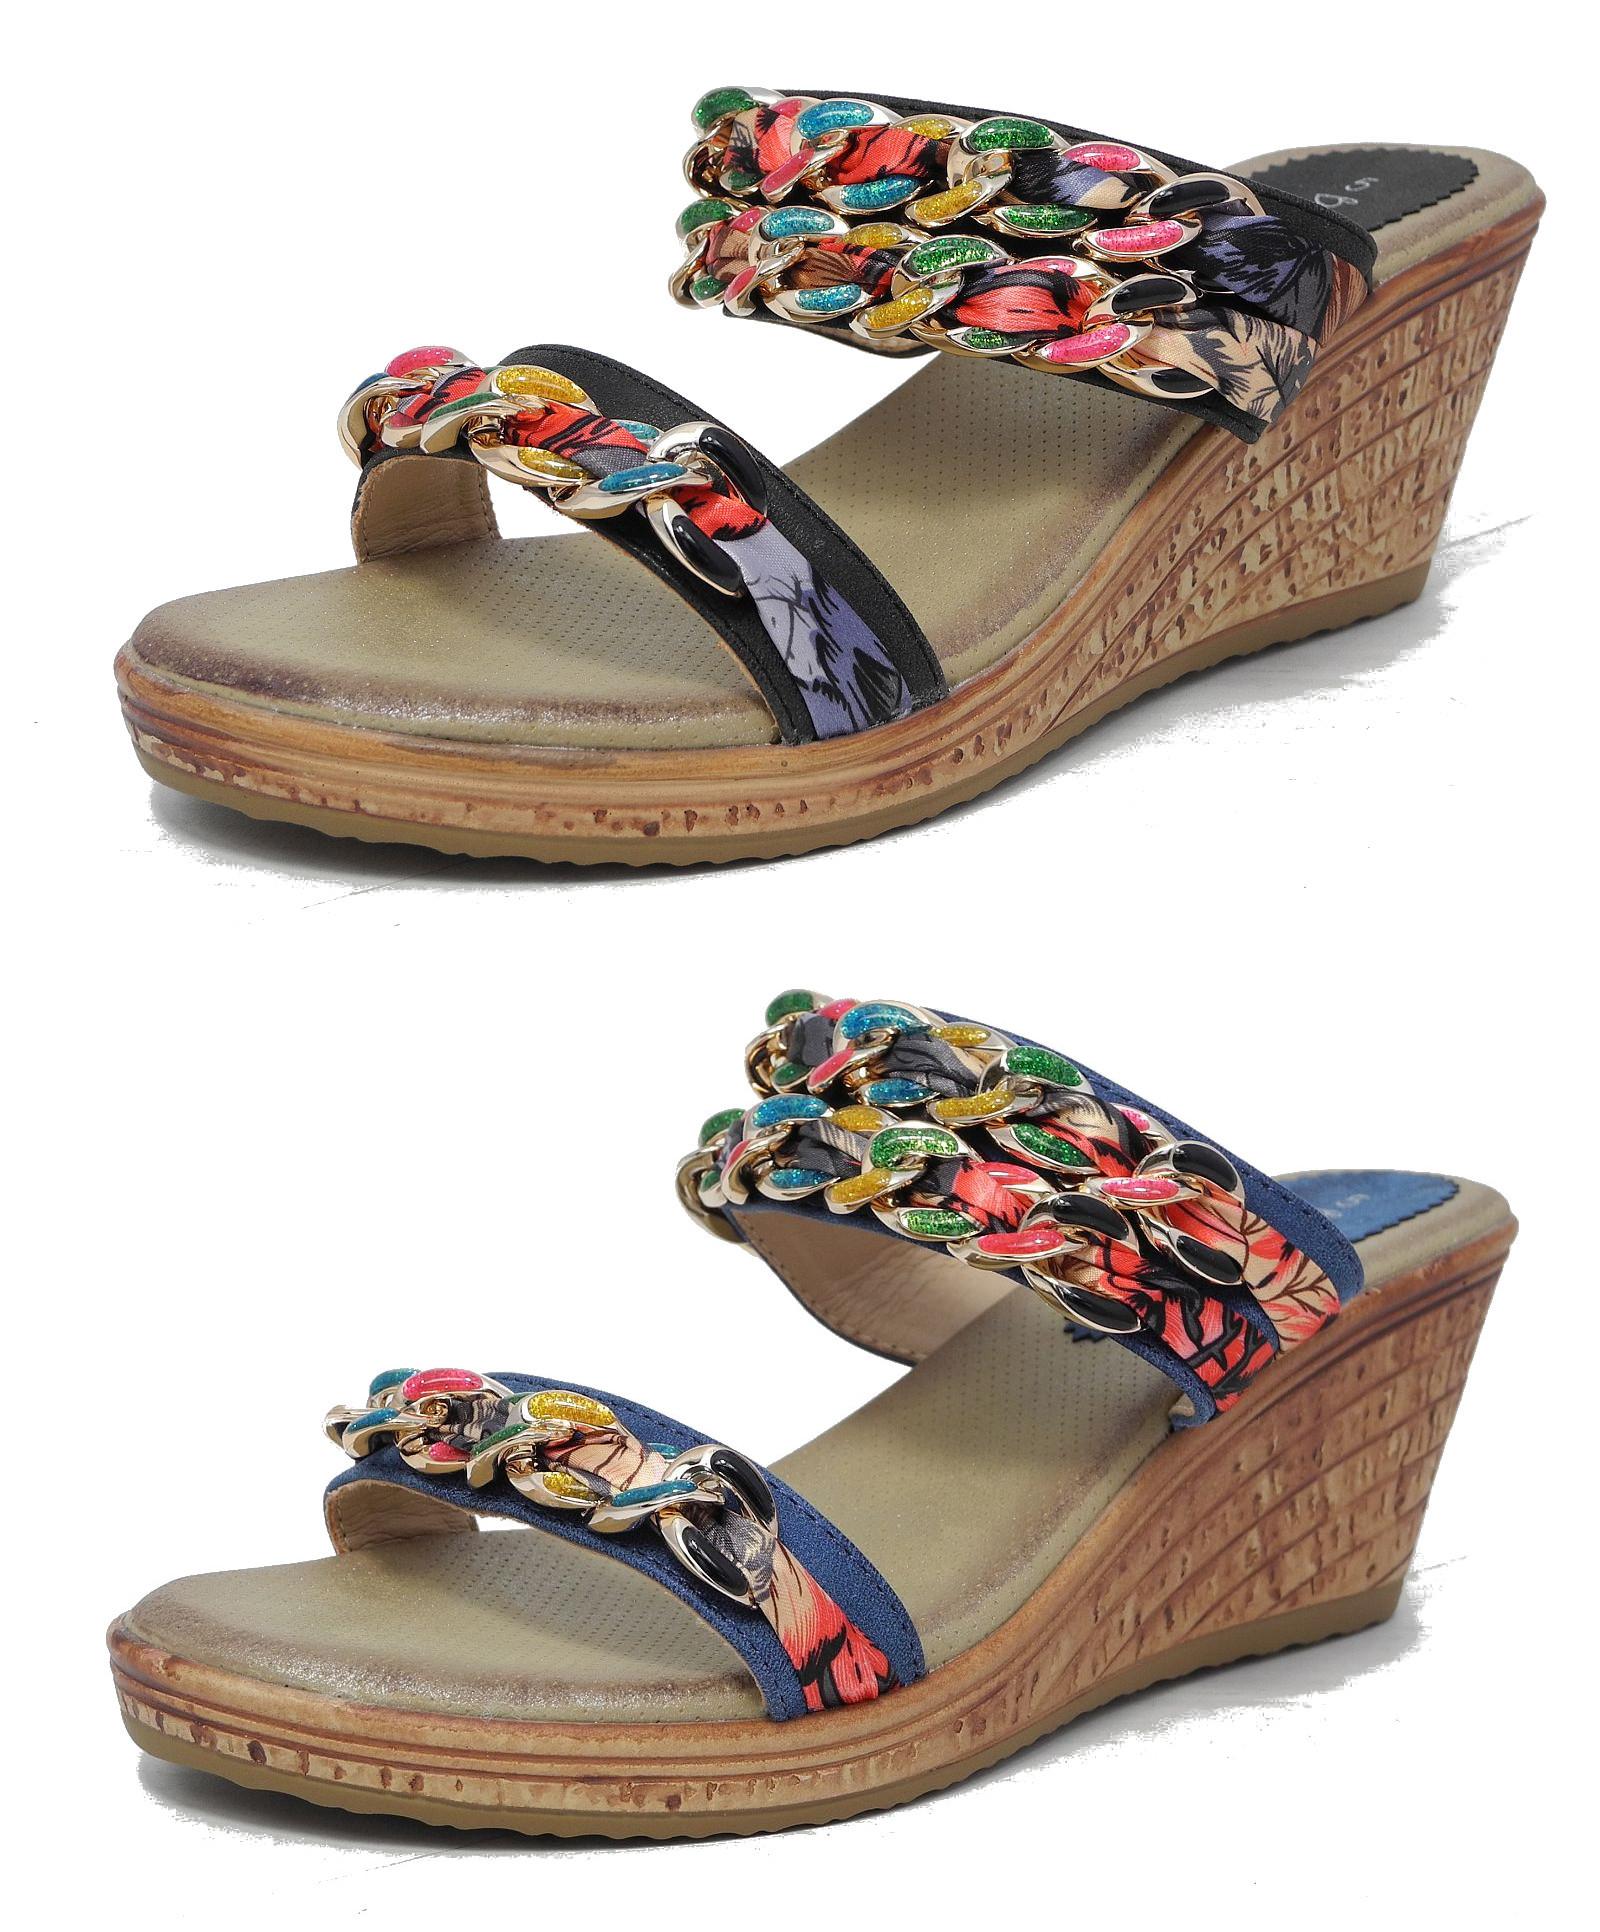 femmes coussin confort compens talon moyen sandales mules size 3 4 5 6 7 8 ebay. Black Bedroom Furniture Sets. Home Design Ideas